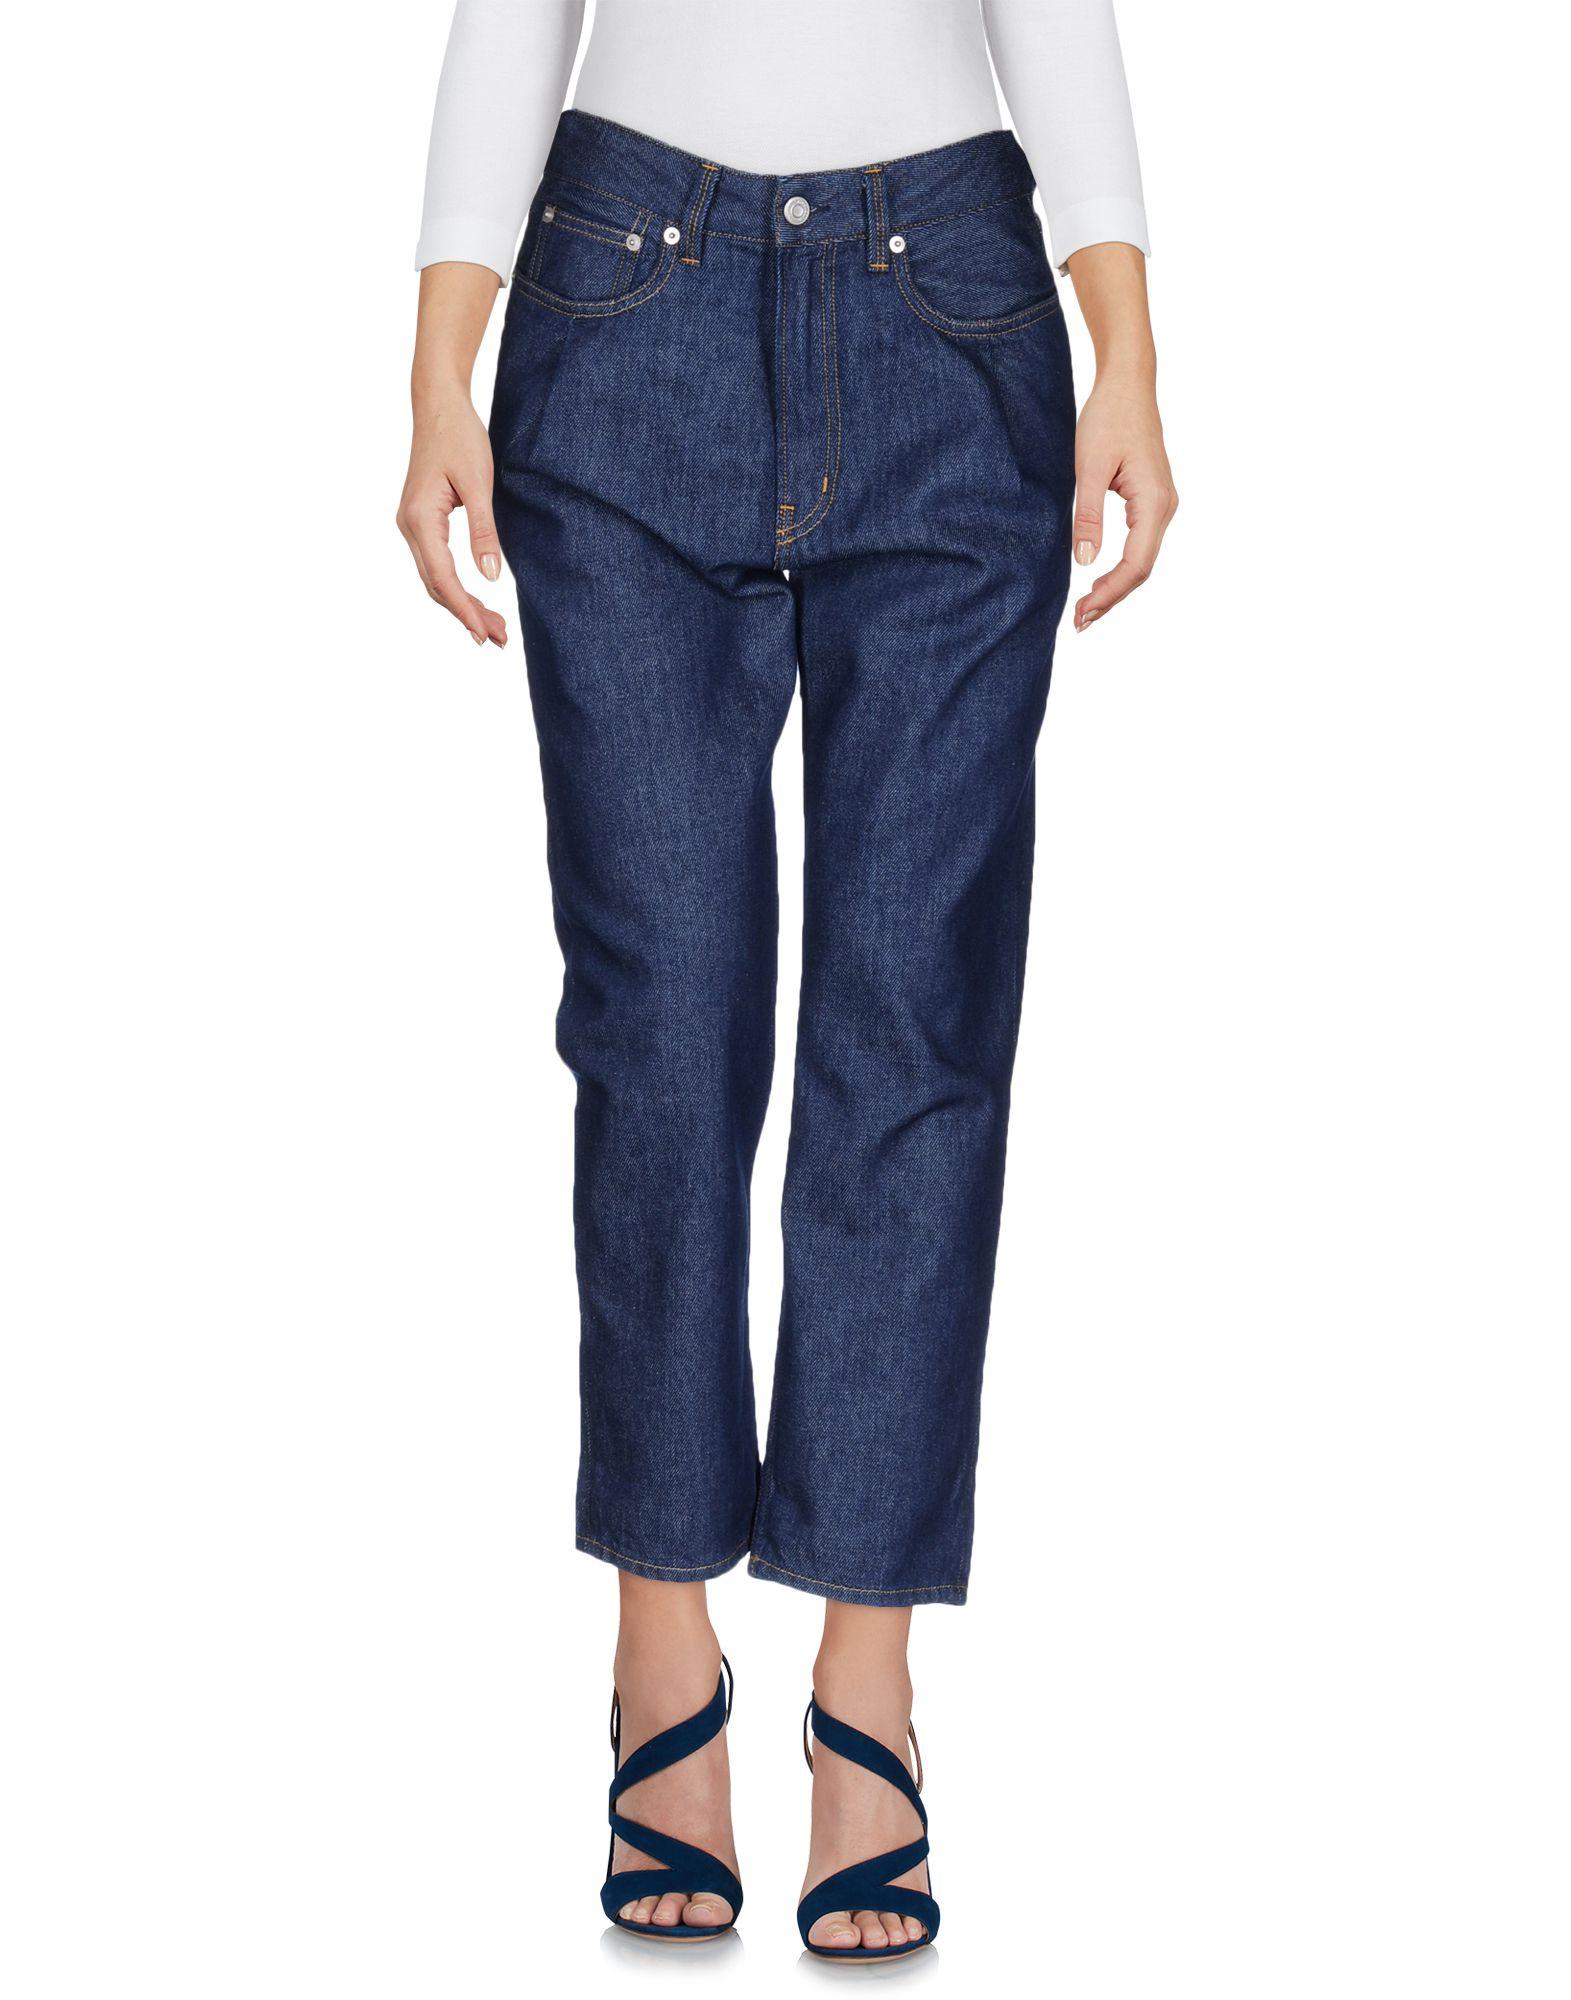 Pantaloni Jeans Coverde donna donna - 13025839RX  große Einsparungen